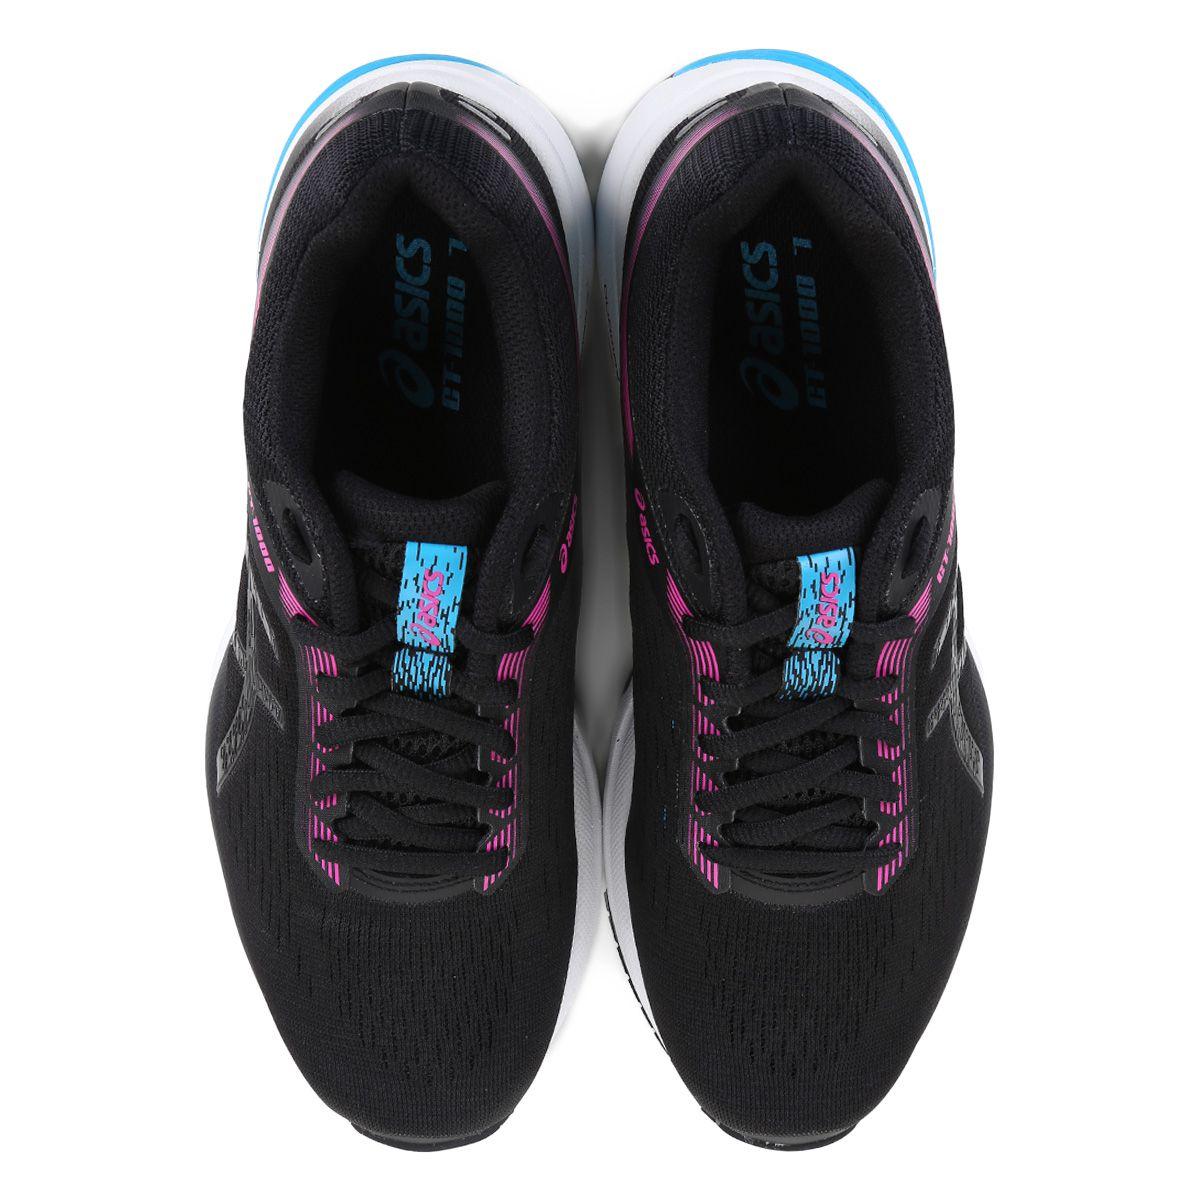 Tênis Asics GT 1000 7 Feminino - Preto e Pink